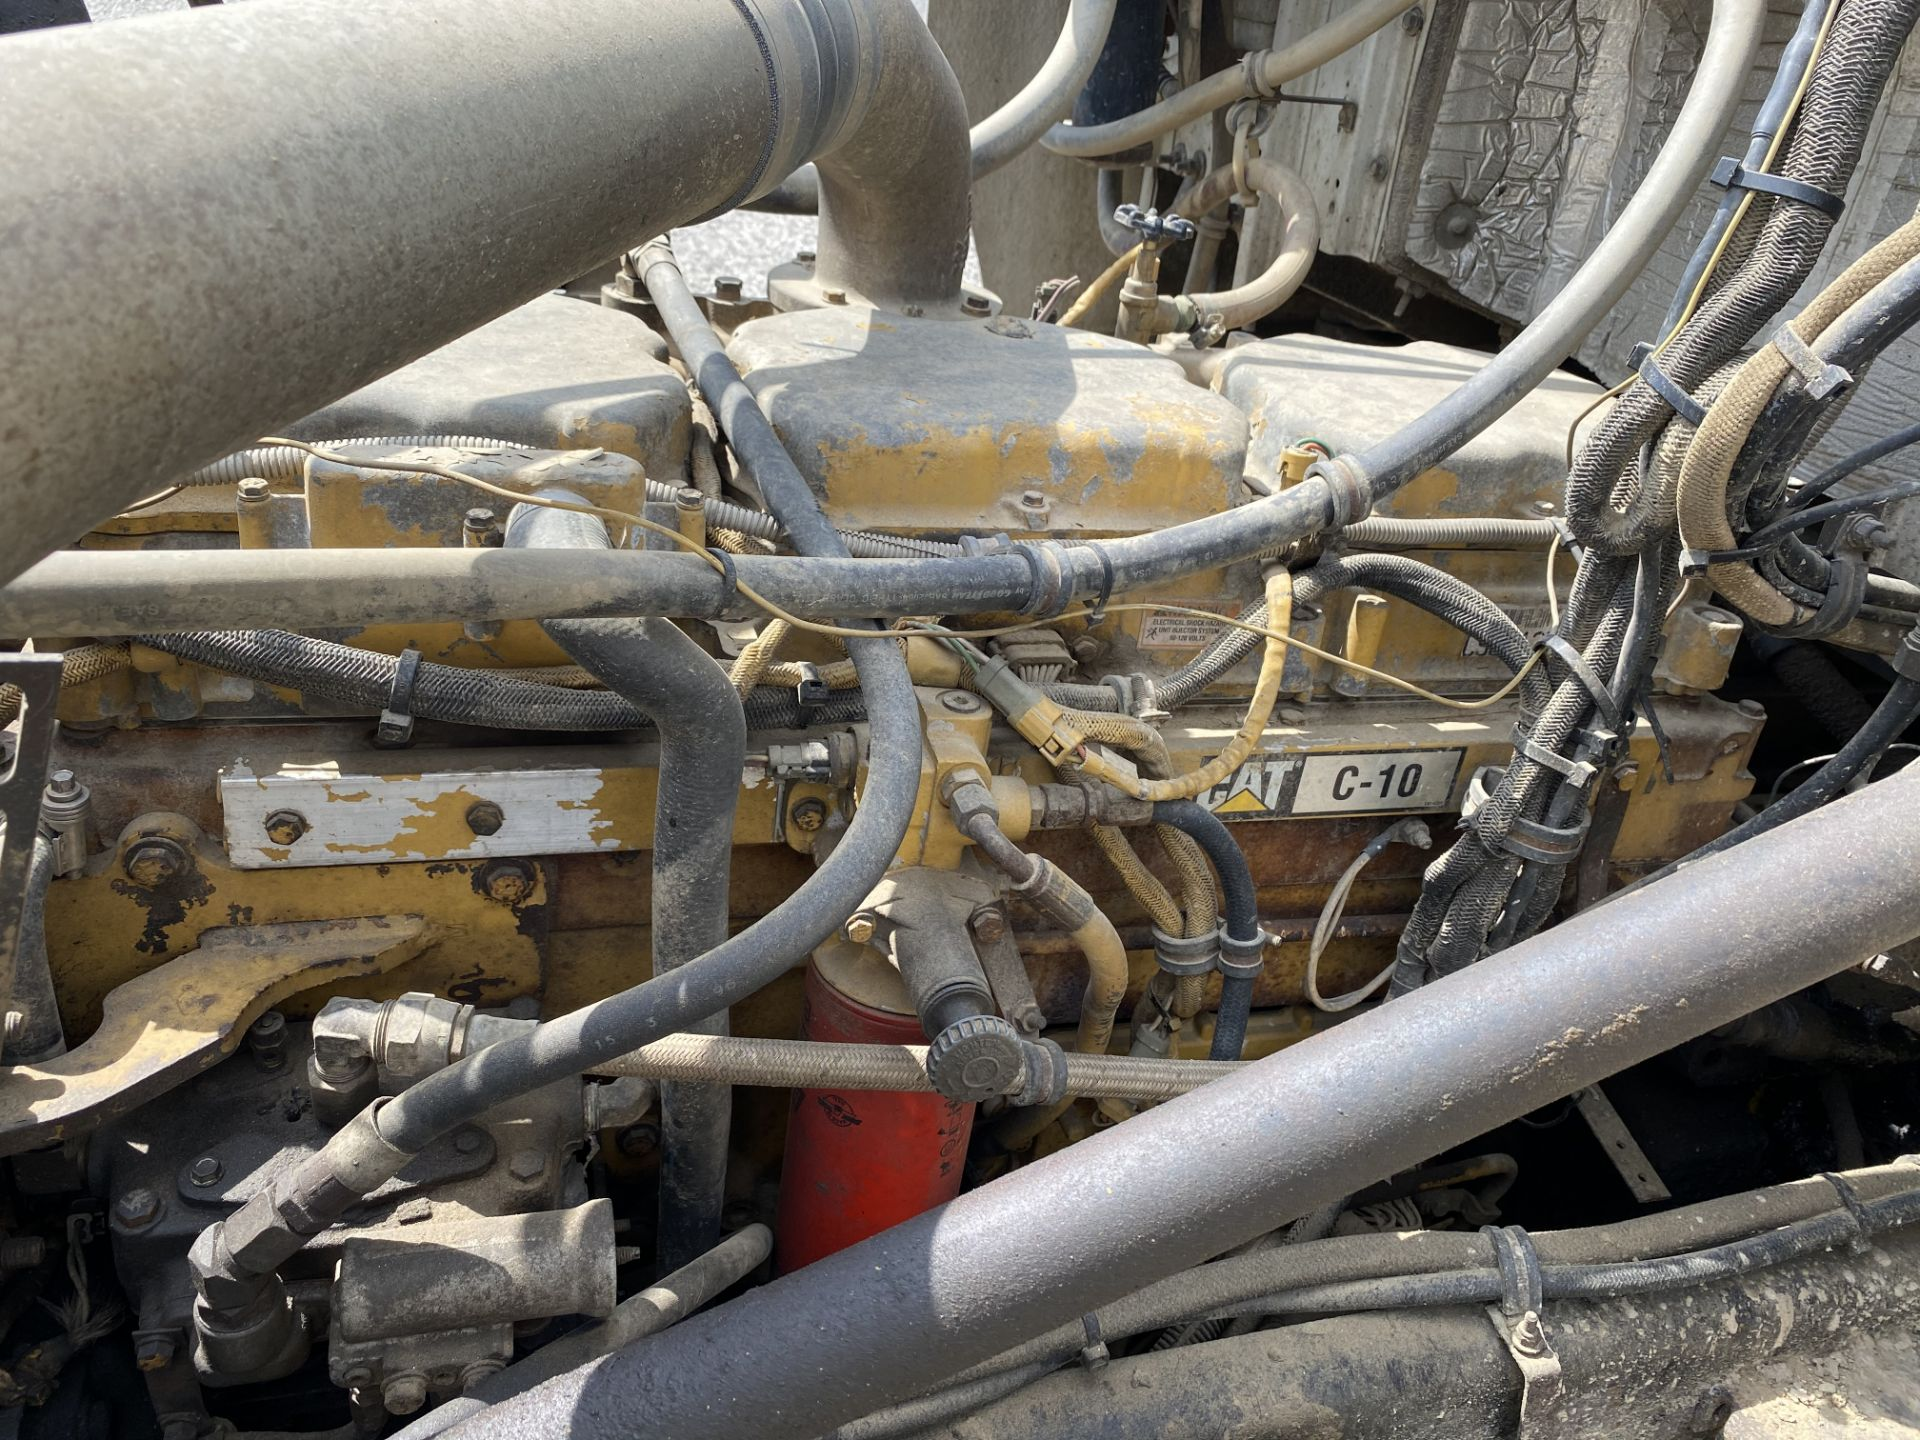 2000 Western Star 12 Wheel Dump w/ Drop Axle, Cat Diesel C10 6 CYL. 78,000 GVWR, ODOM 323,142, - Image 8 of 8